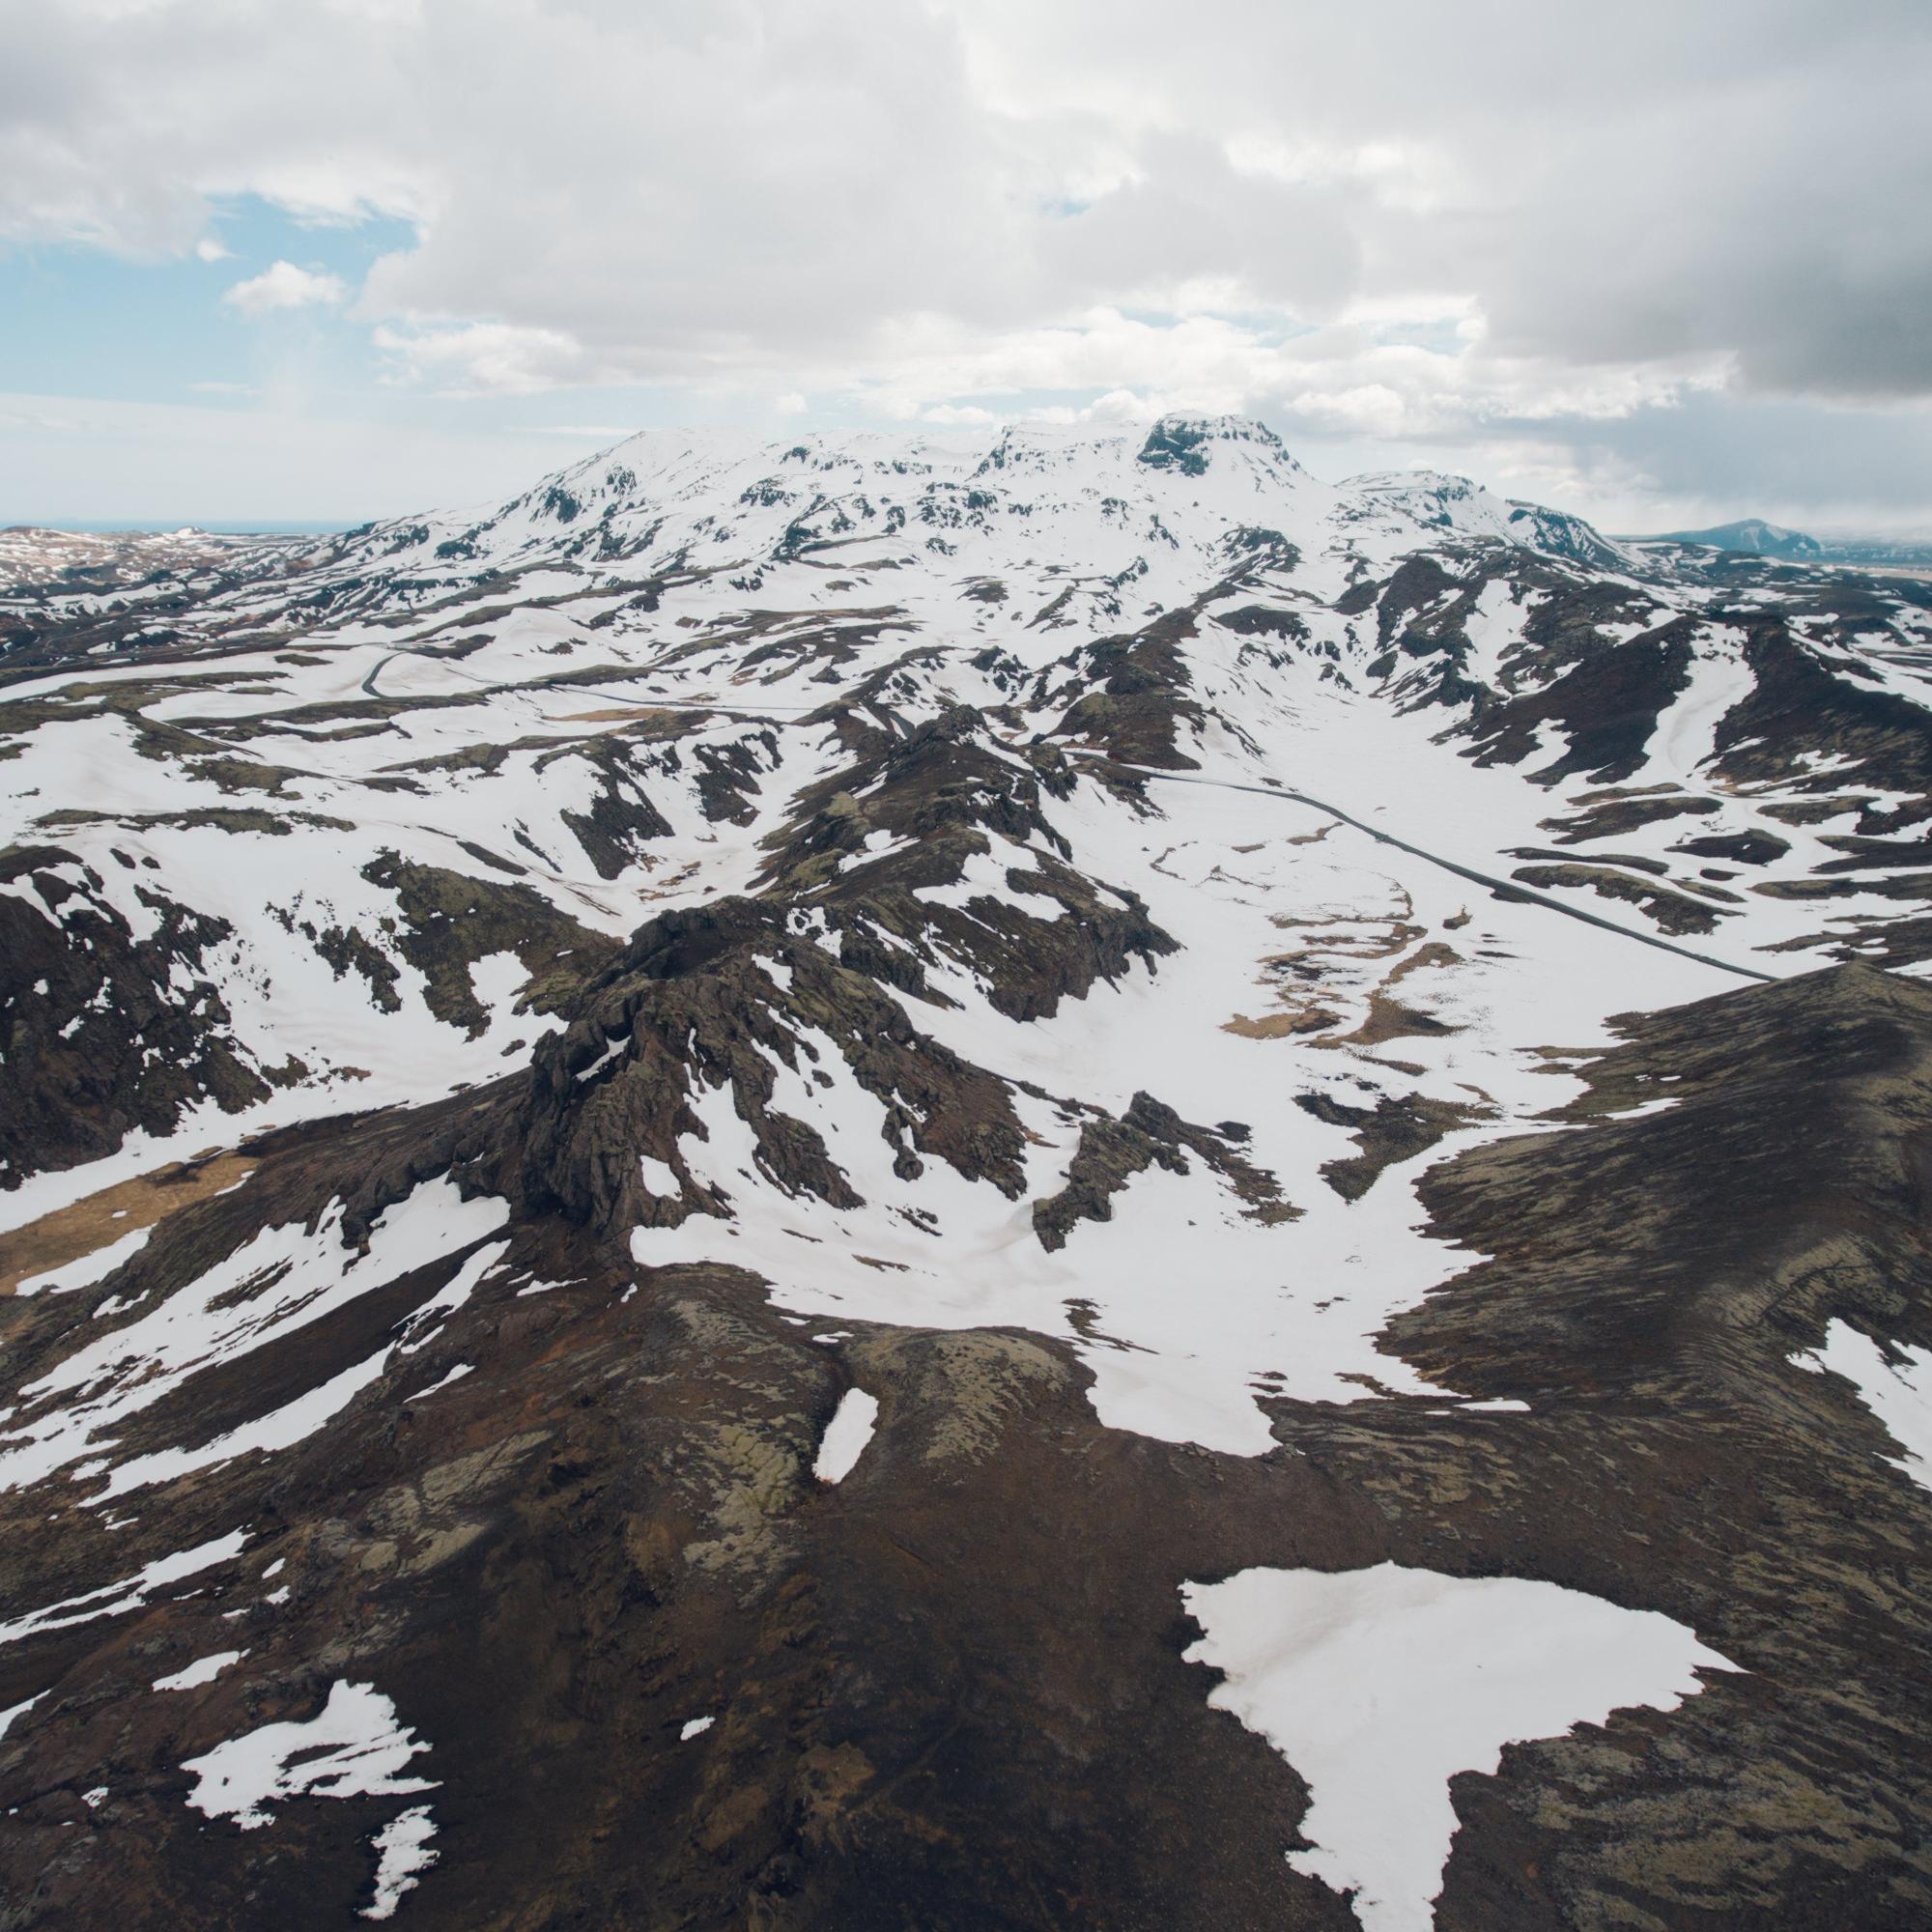 wrenee-iceland-part-1-8-snow-drone.jpg